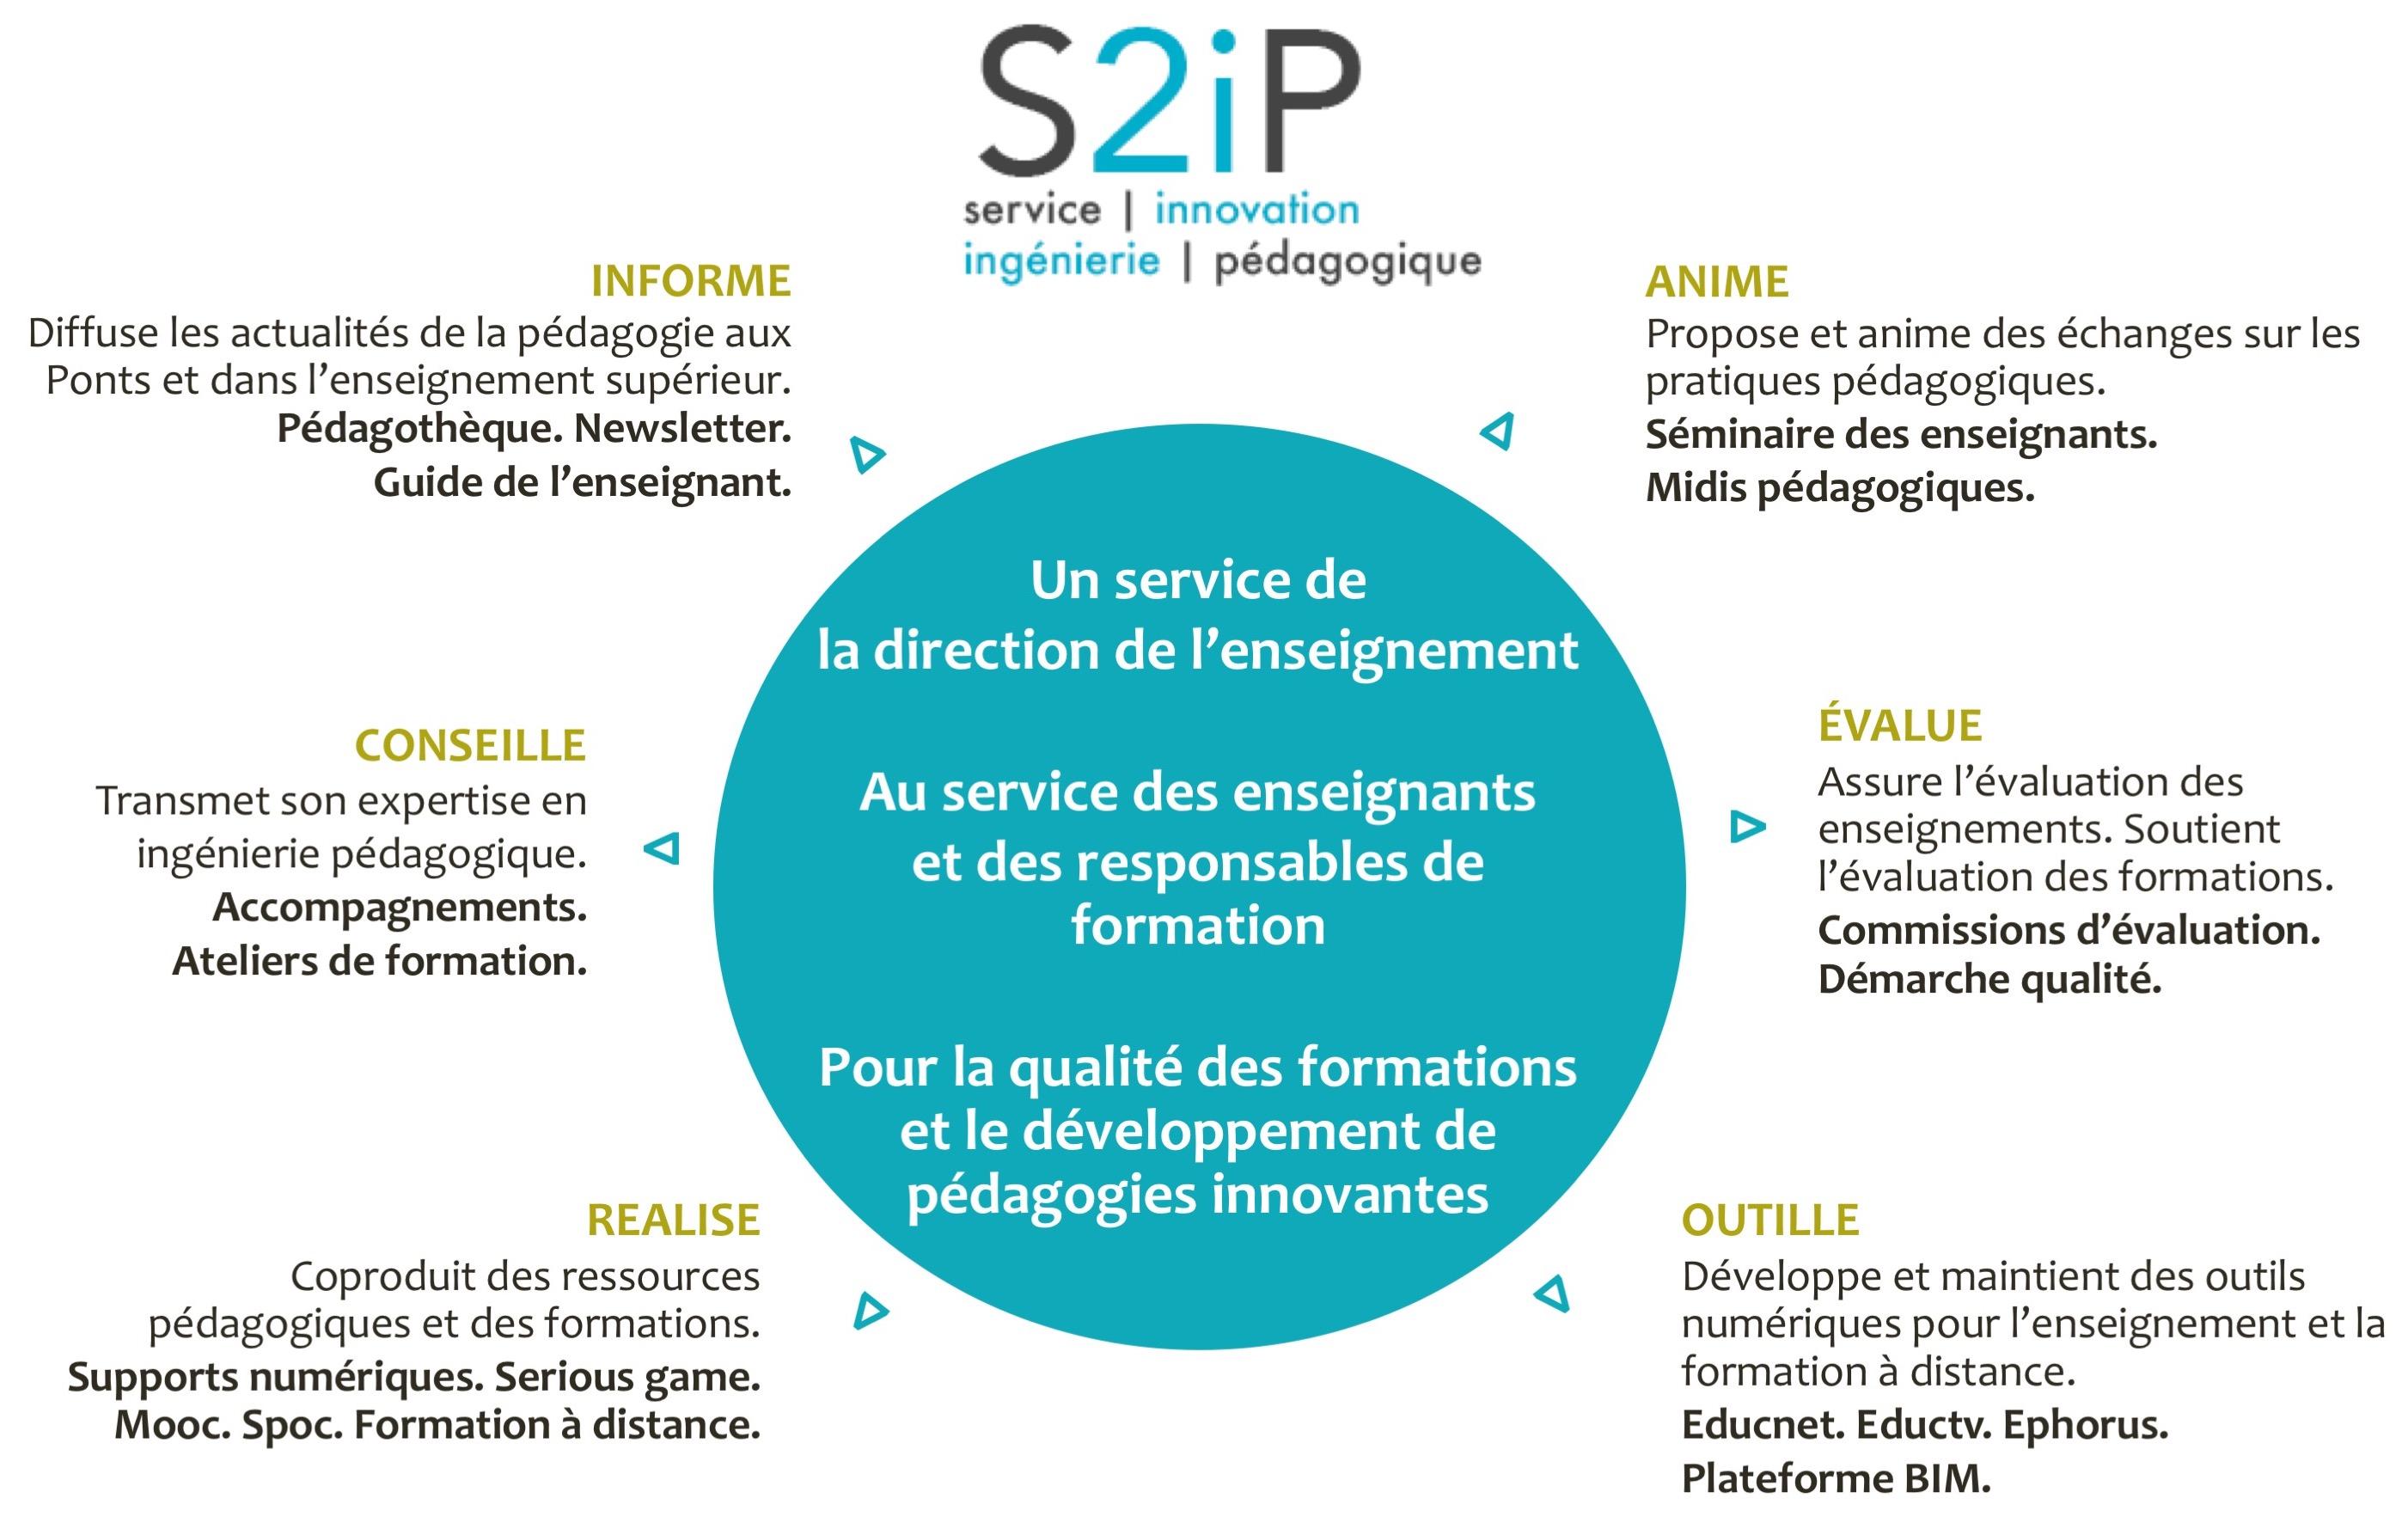 Missions S2iP